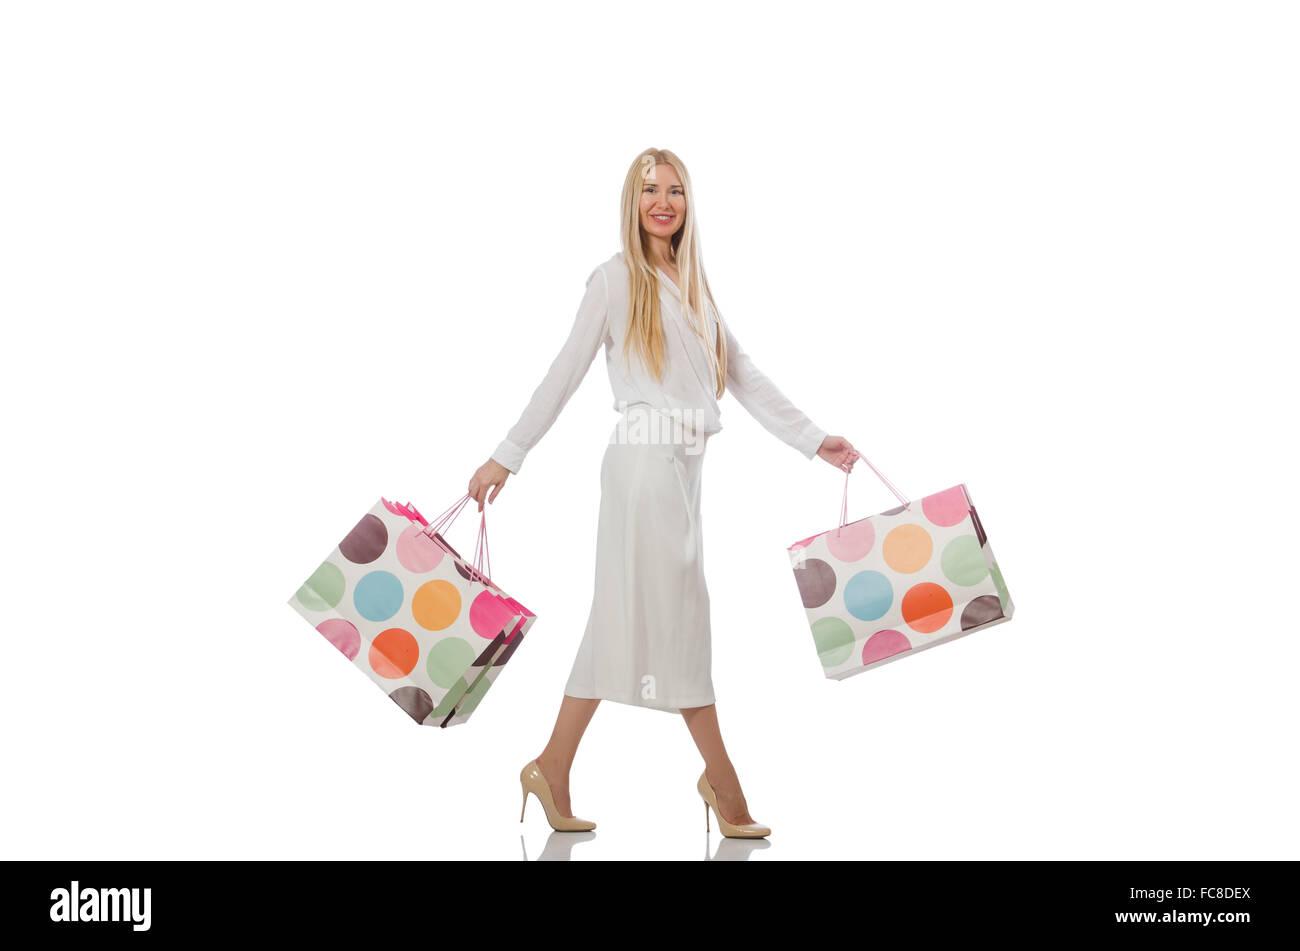 Bags Che Imágenes De Stock   Bags Che Fotos De Stock - Alamy 8e77f0b0110